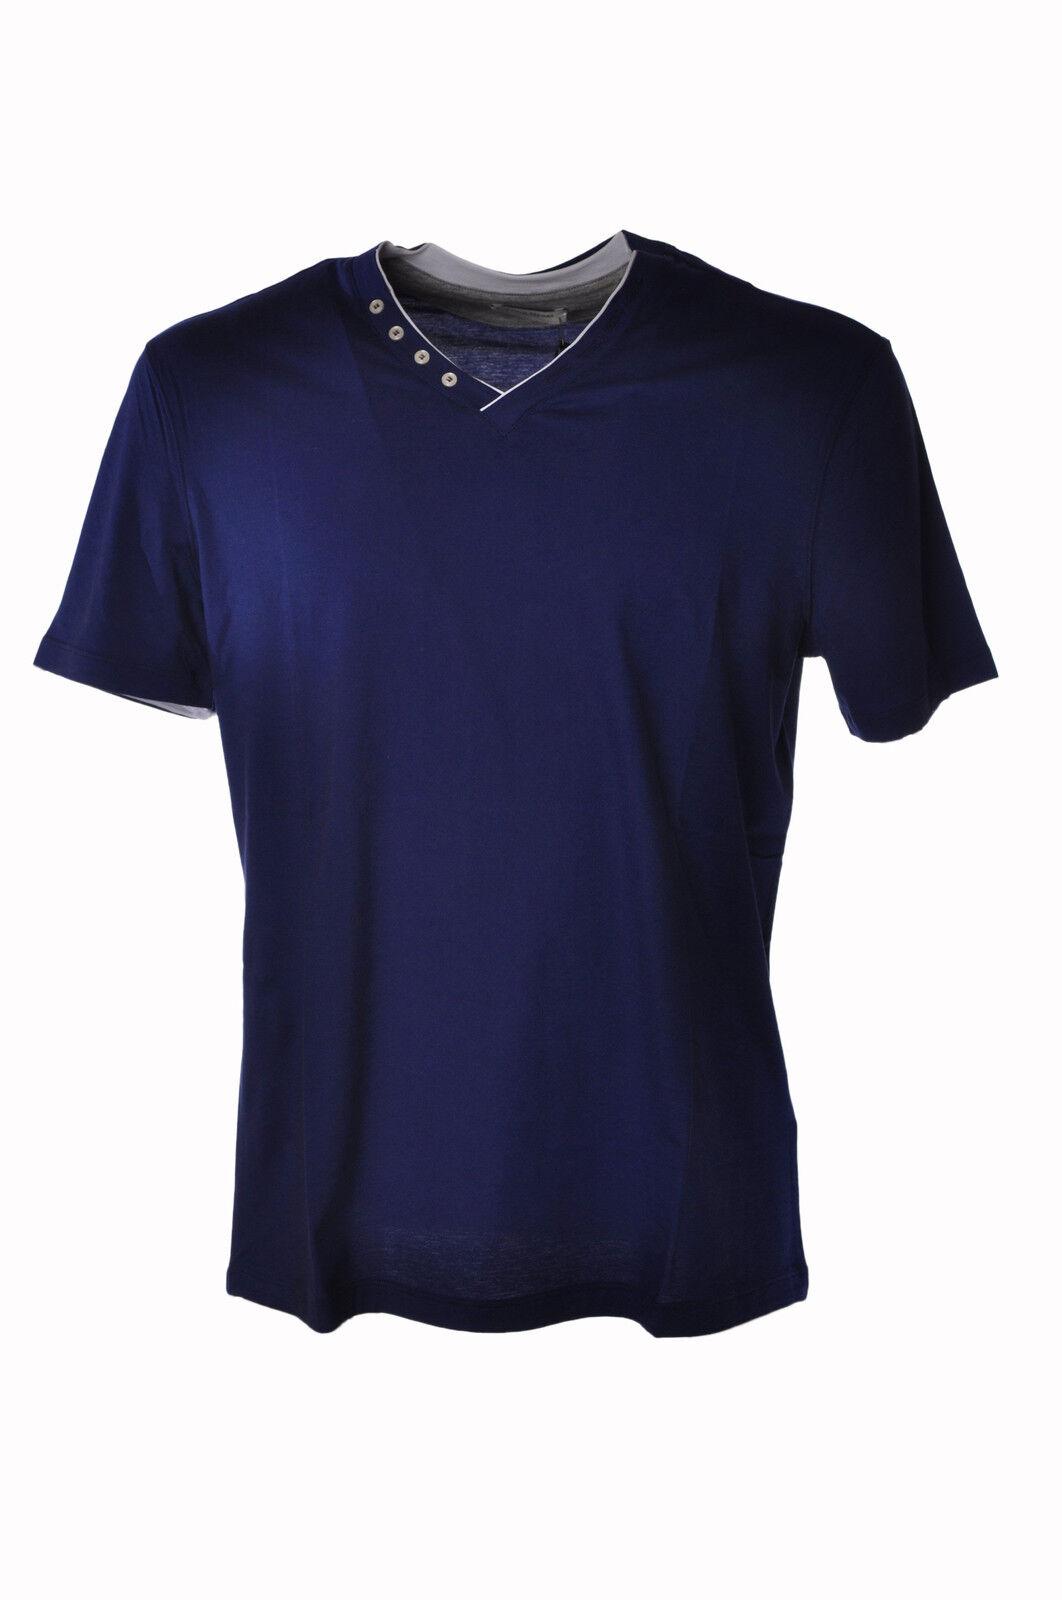 Paolo Pecora - Topwear-T-shirts - Mann - Blau - 3597903N183526